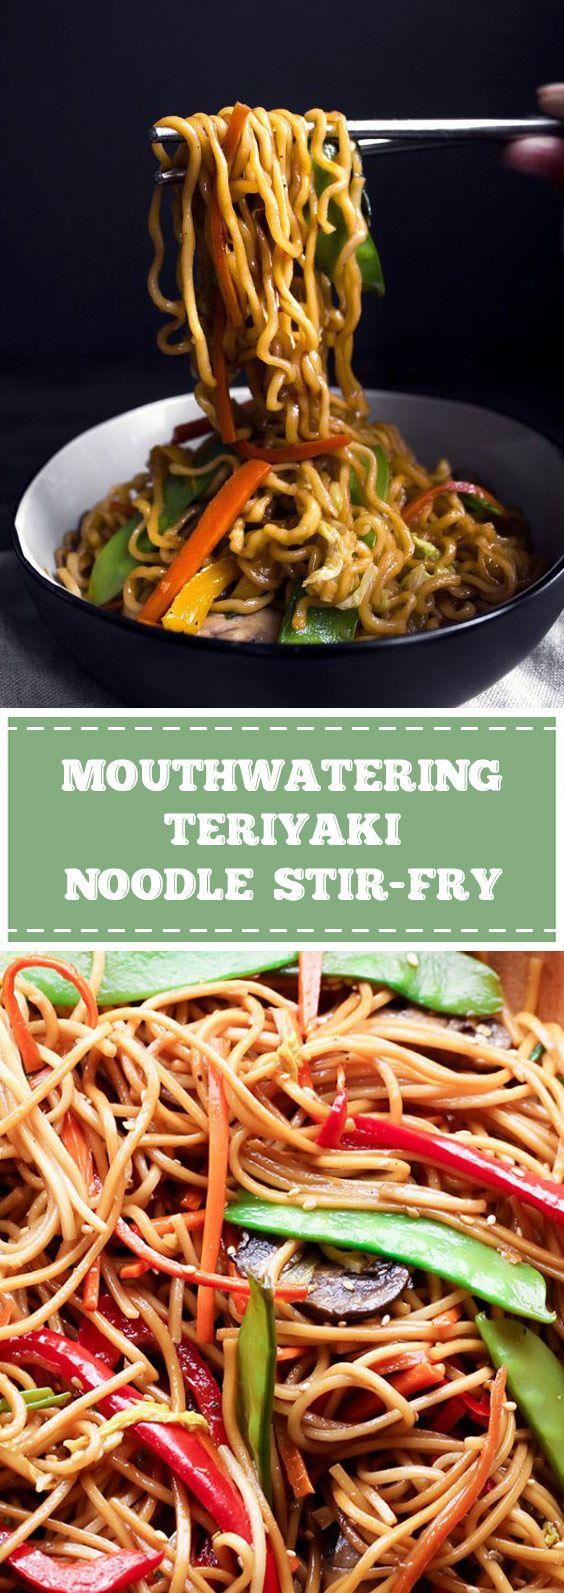 Mouthwatering Teriyaki Noodle Stir-Fry - goodrecipes.club